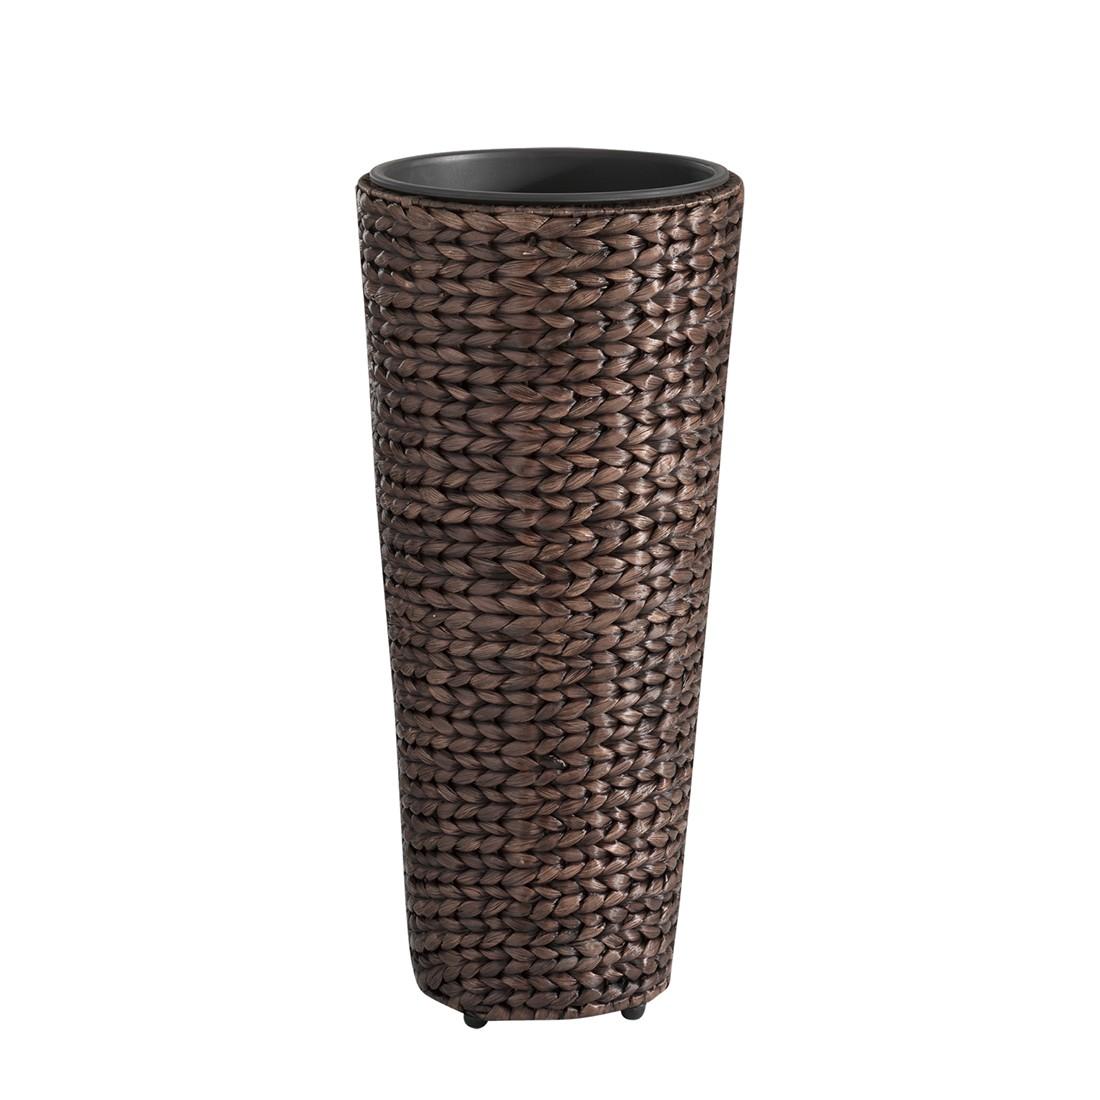 pflanzk bel 60 cm pflanzk bel montana 60 cm mit passendem untersetzer montana romana terracotta. Black Bedroom Furniture Sets. Home Design Ideas